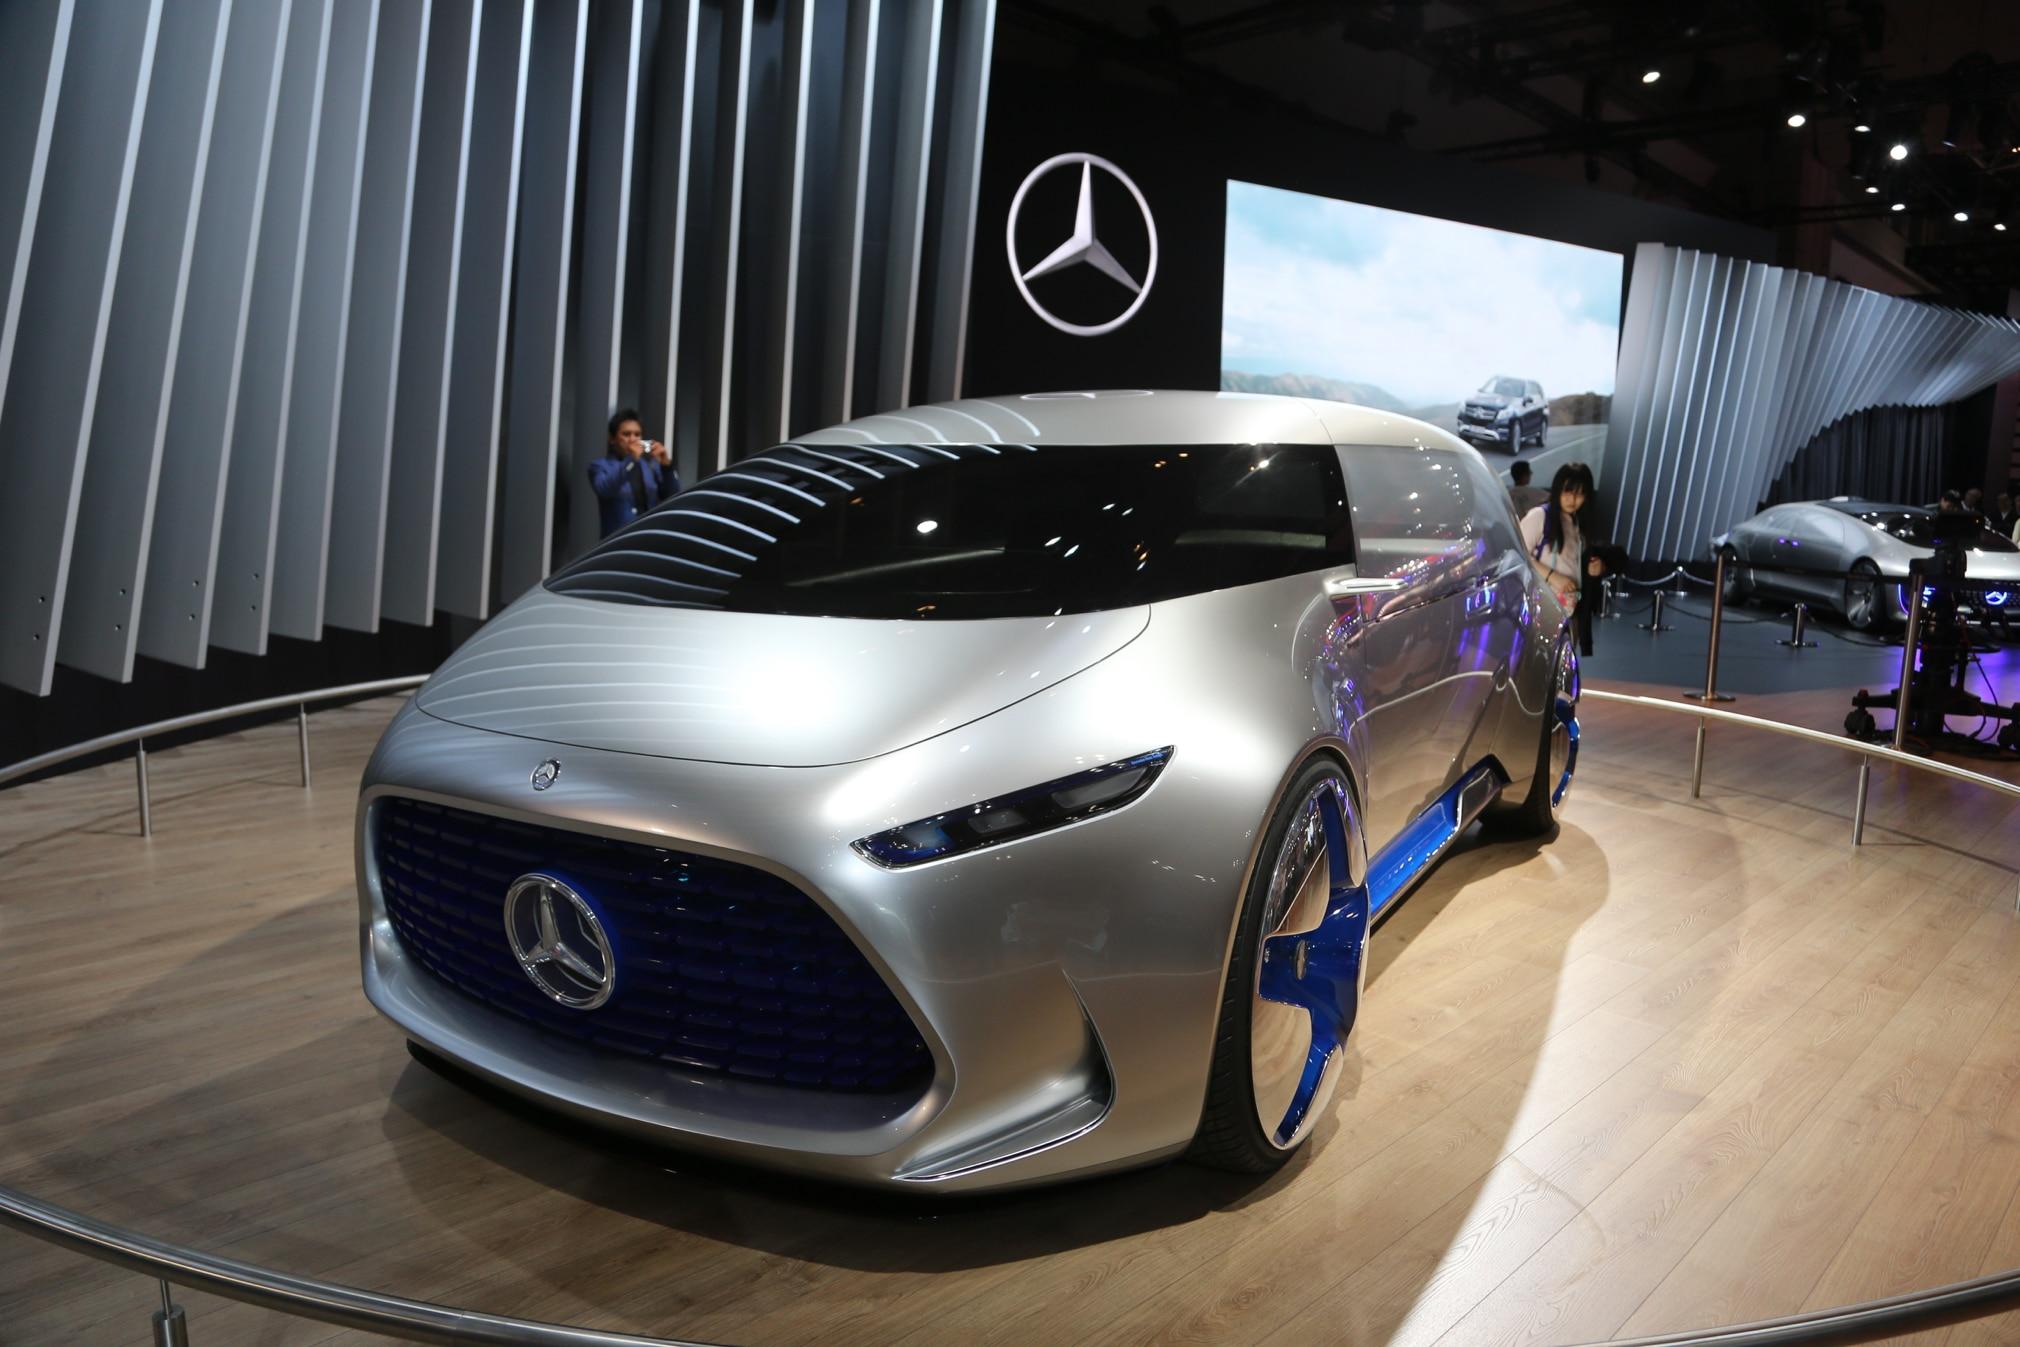 https://st.automobilemag.com/uploads/sites/11/2015/10/Mercedes-Benz-Vision-Tokyo-Concept-front-three-quarter-02.jpg